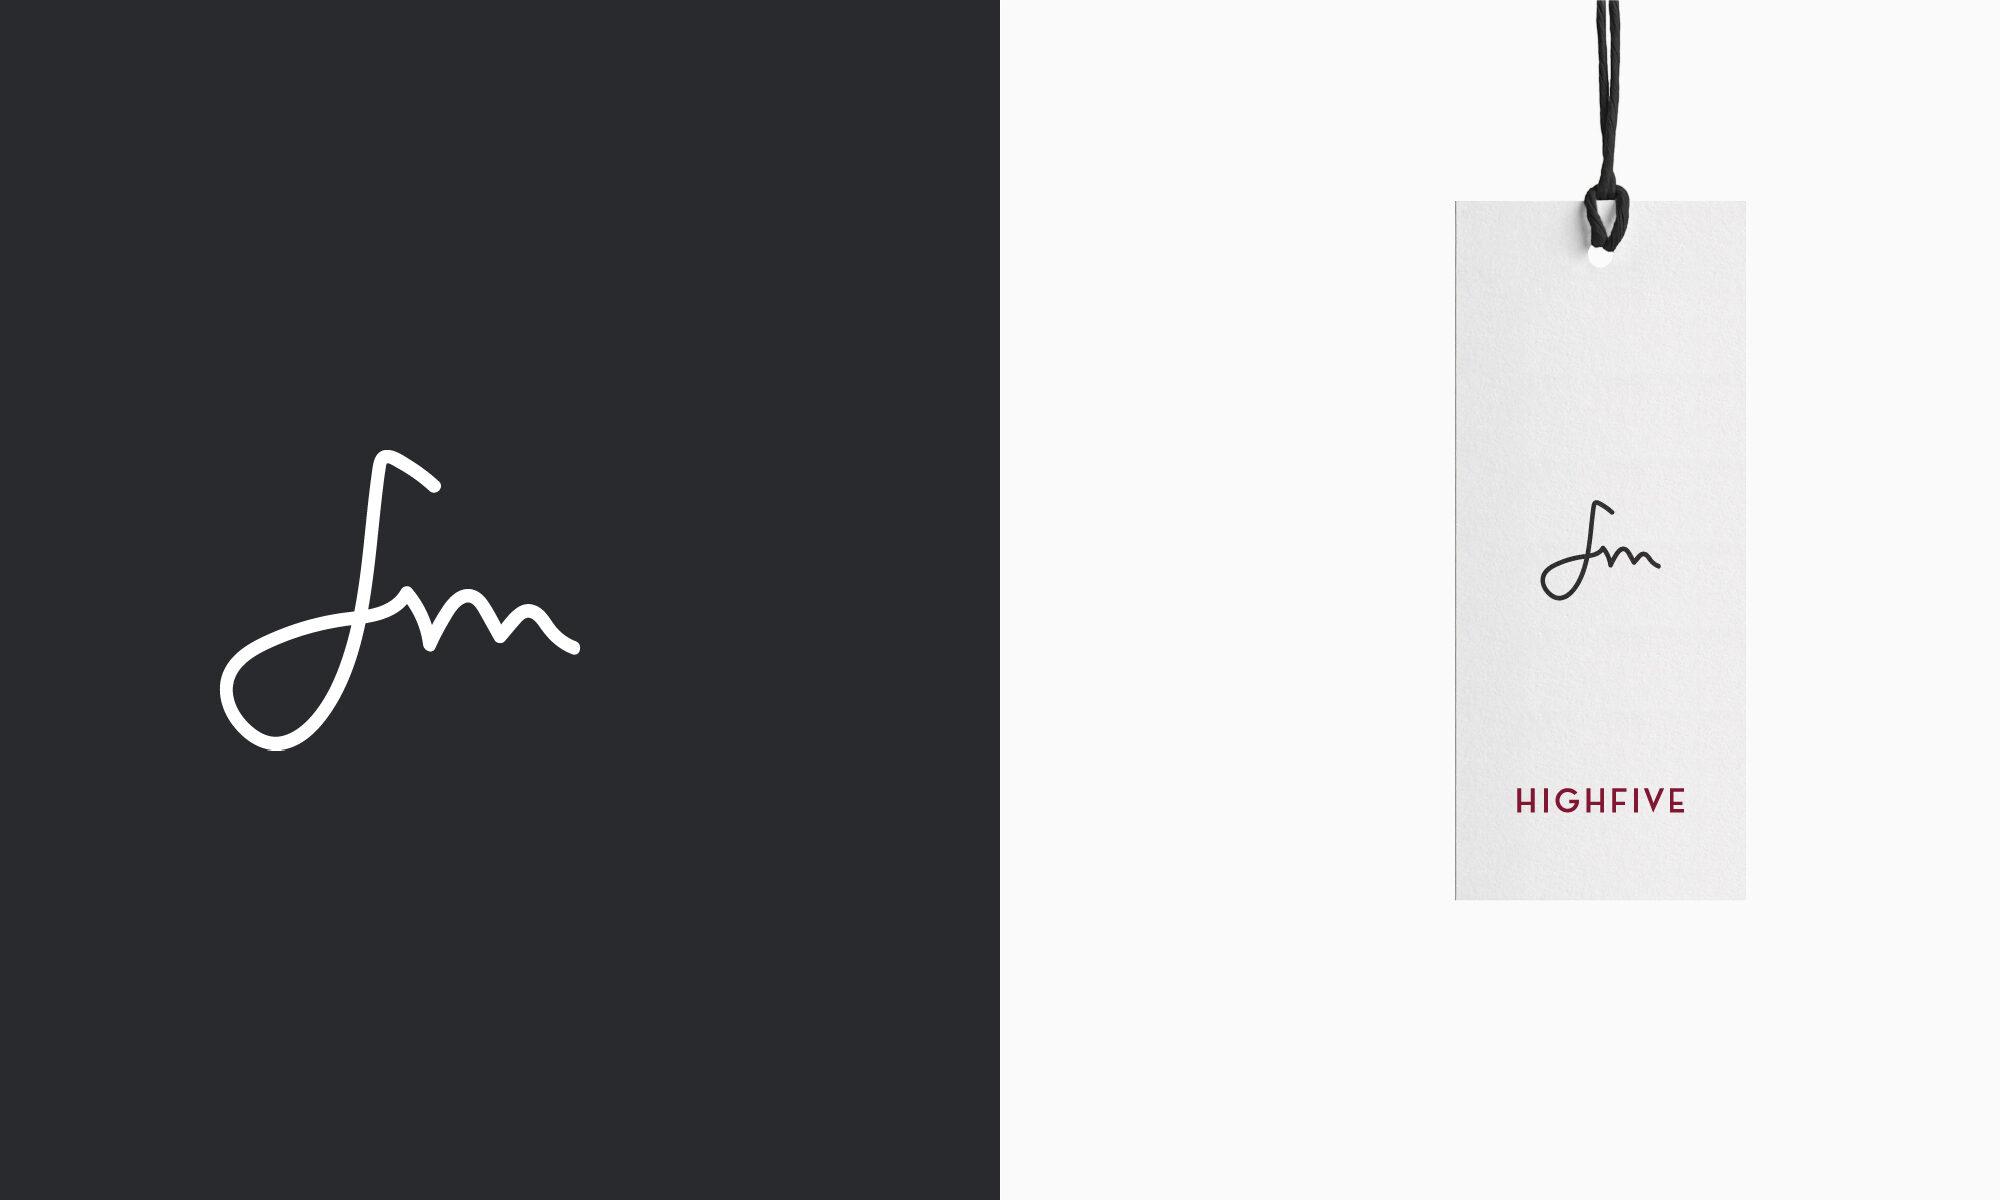 FM | CLOTHING CO | BRANDING